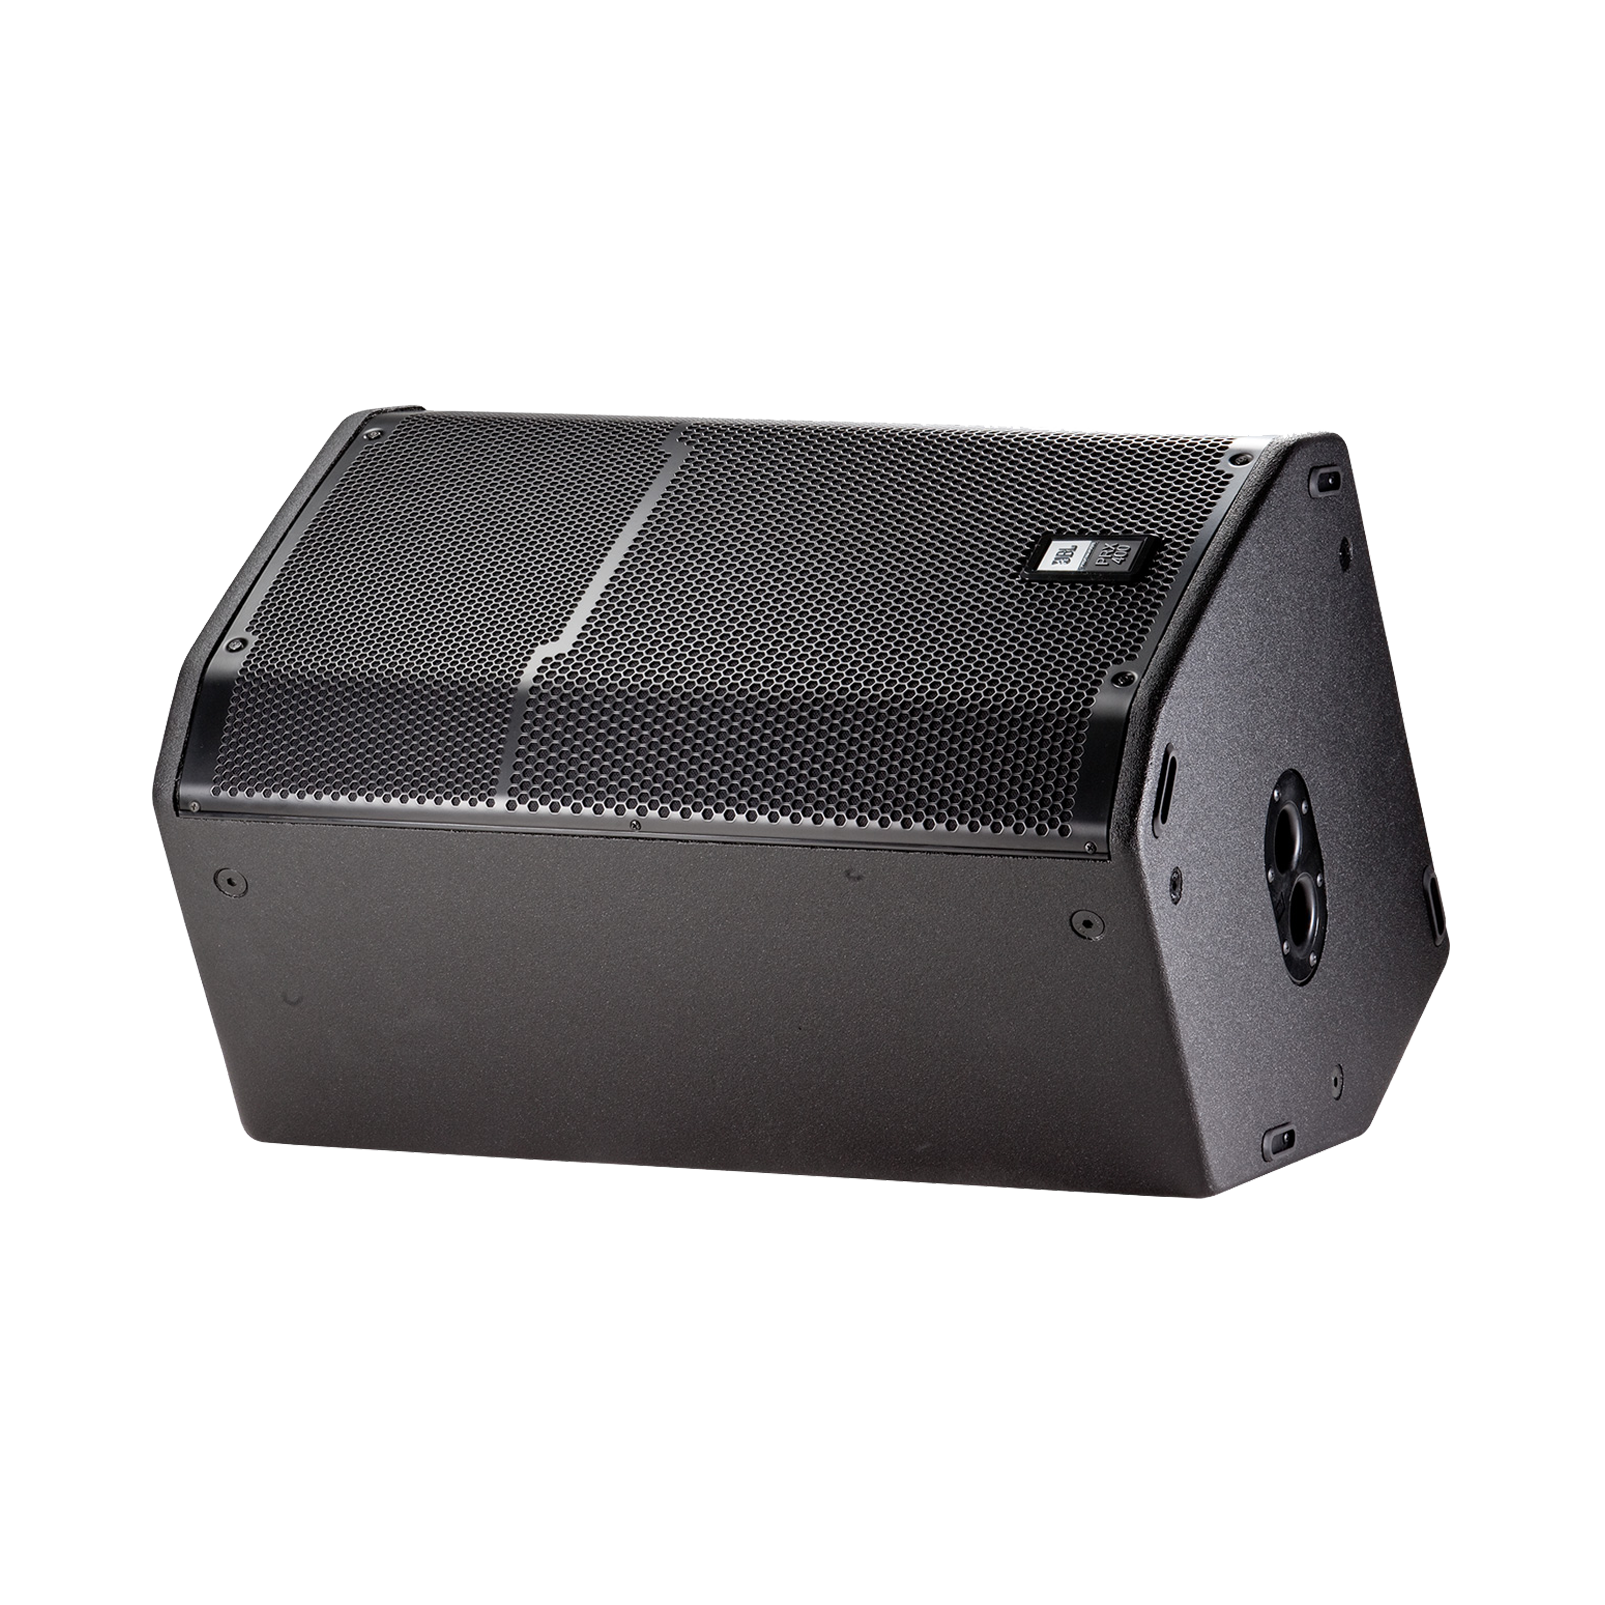 "JBL PRX415M - Black - 15"" Two-Way Stage Monitor and Loudspeaker System - Detailshot 2"